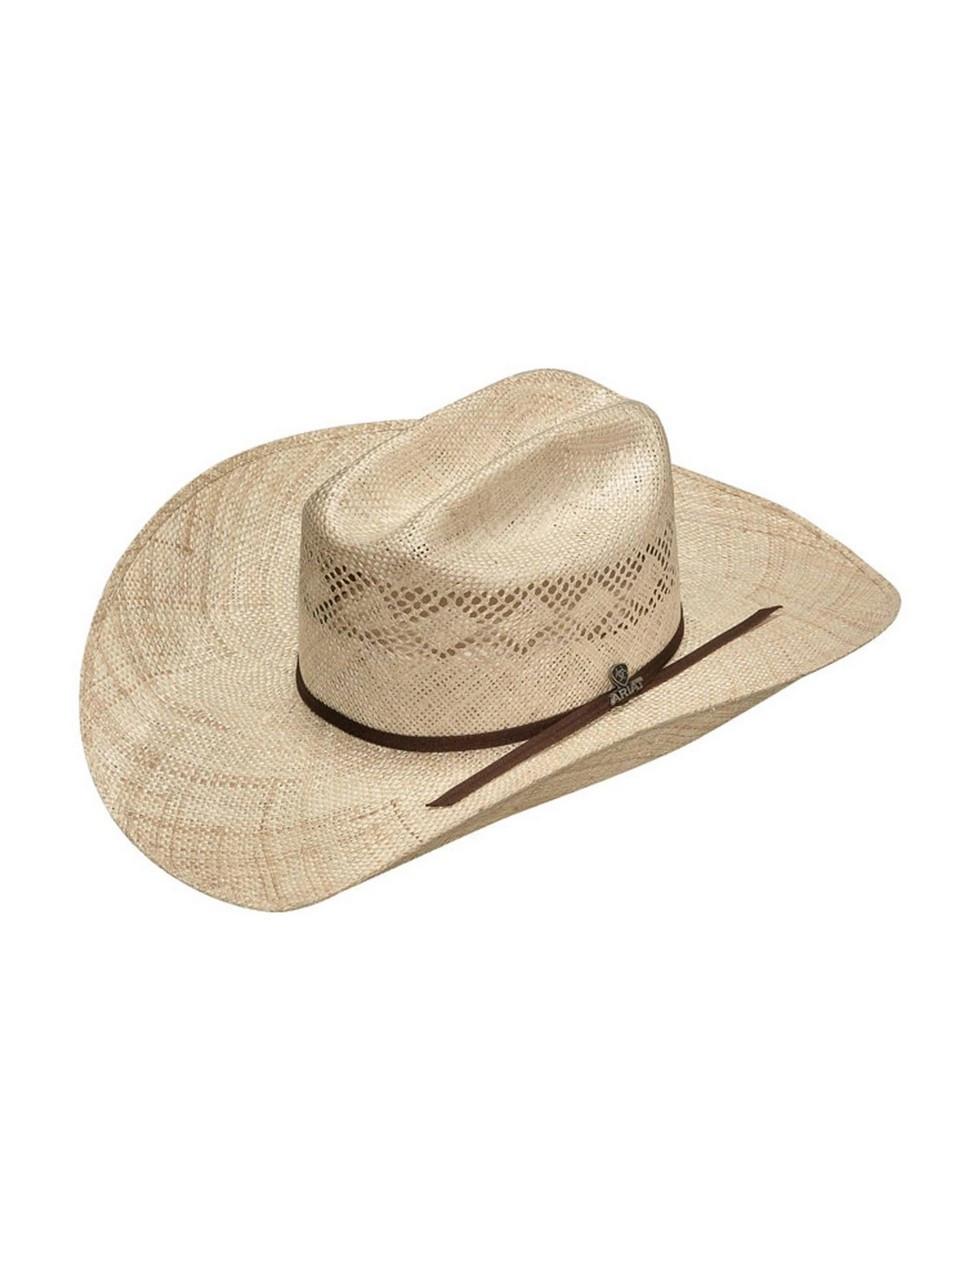 ARIAT Sisal Punchy Hat